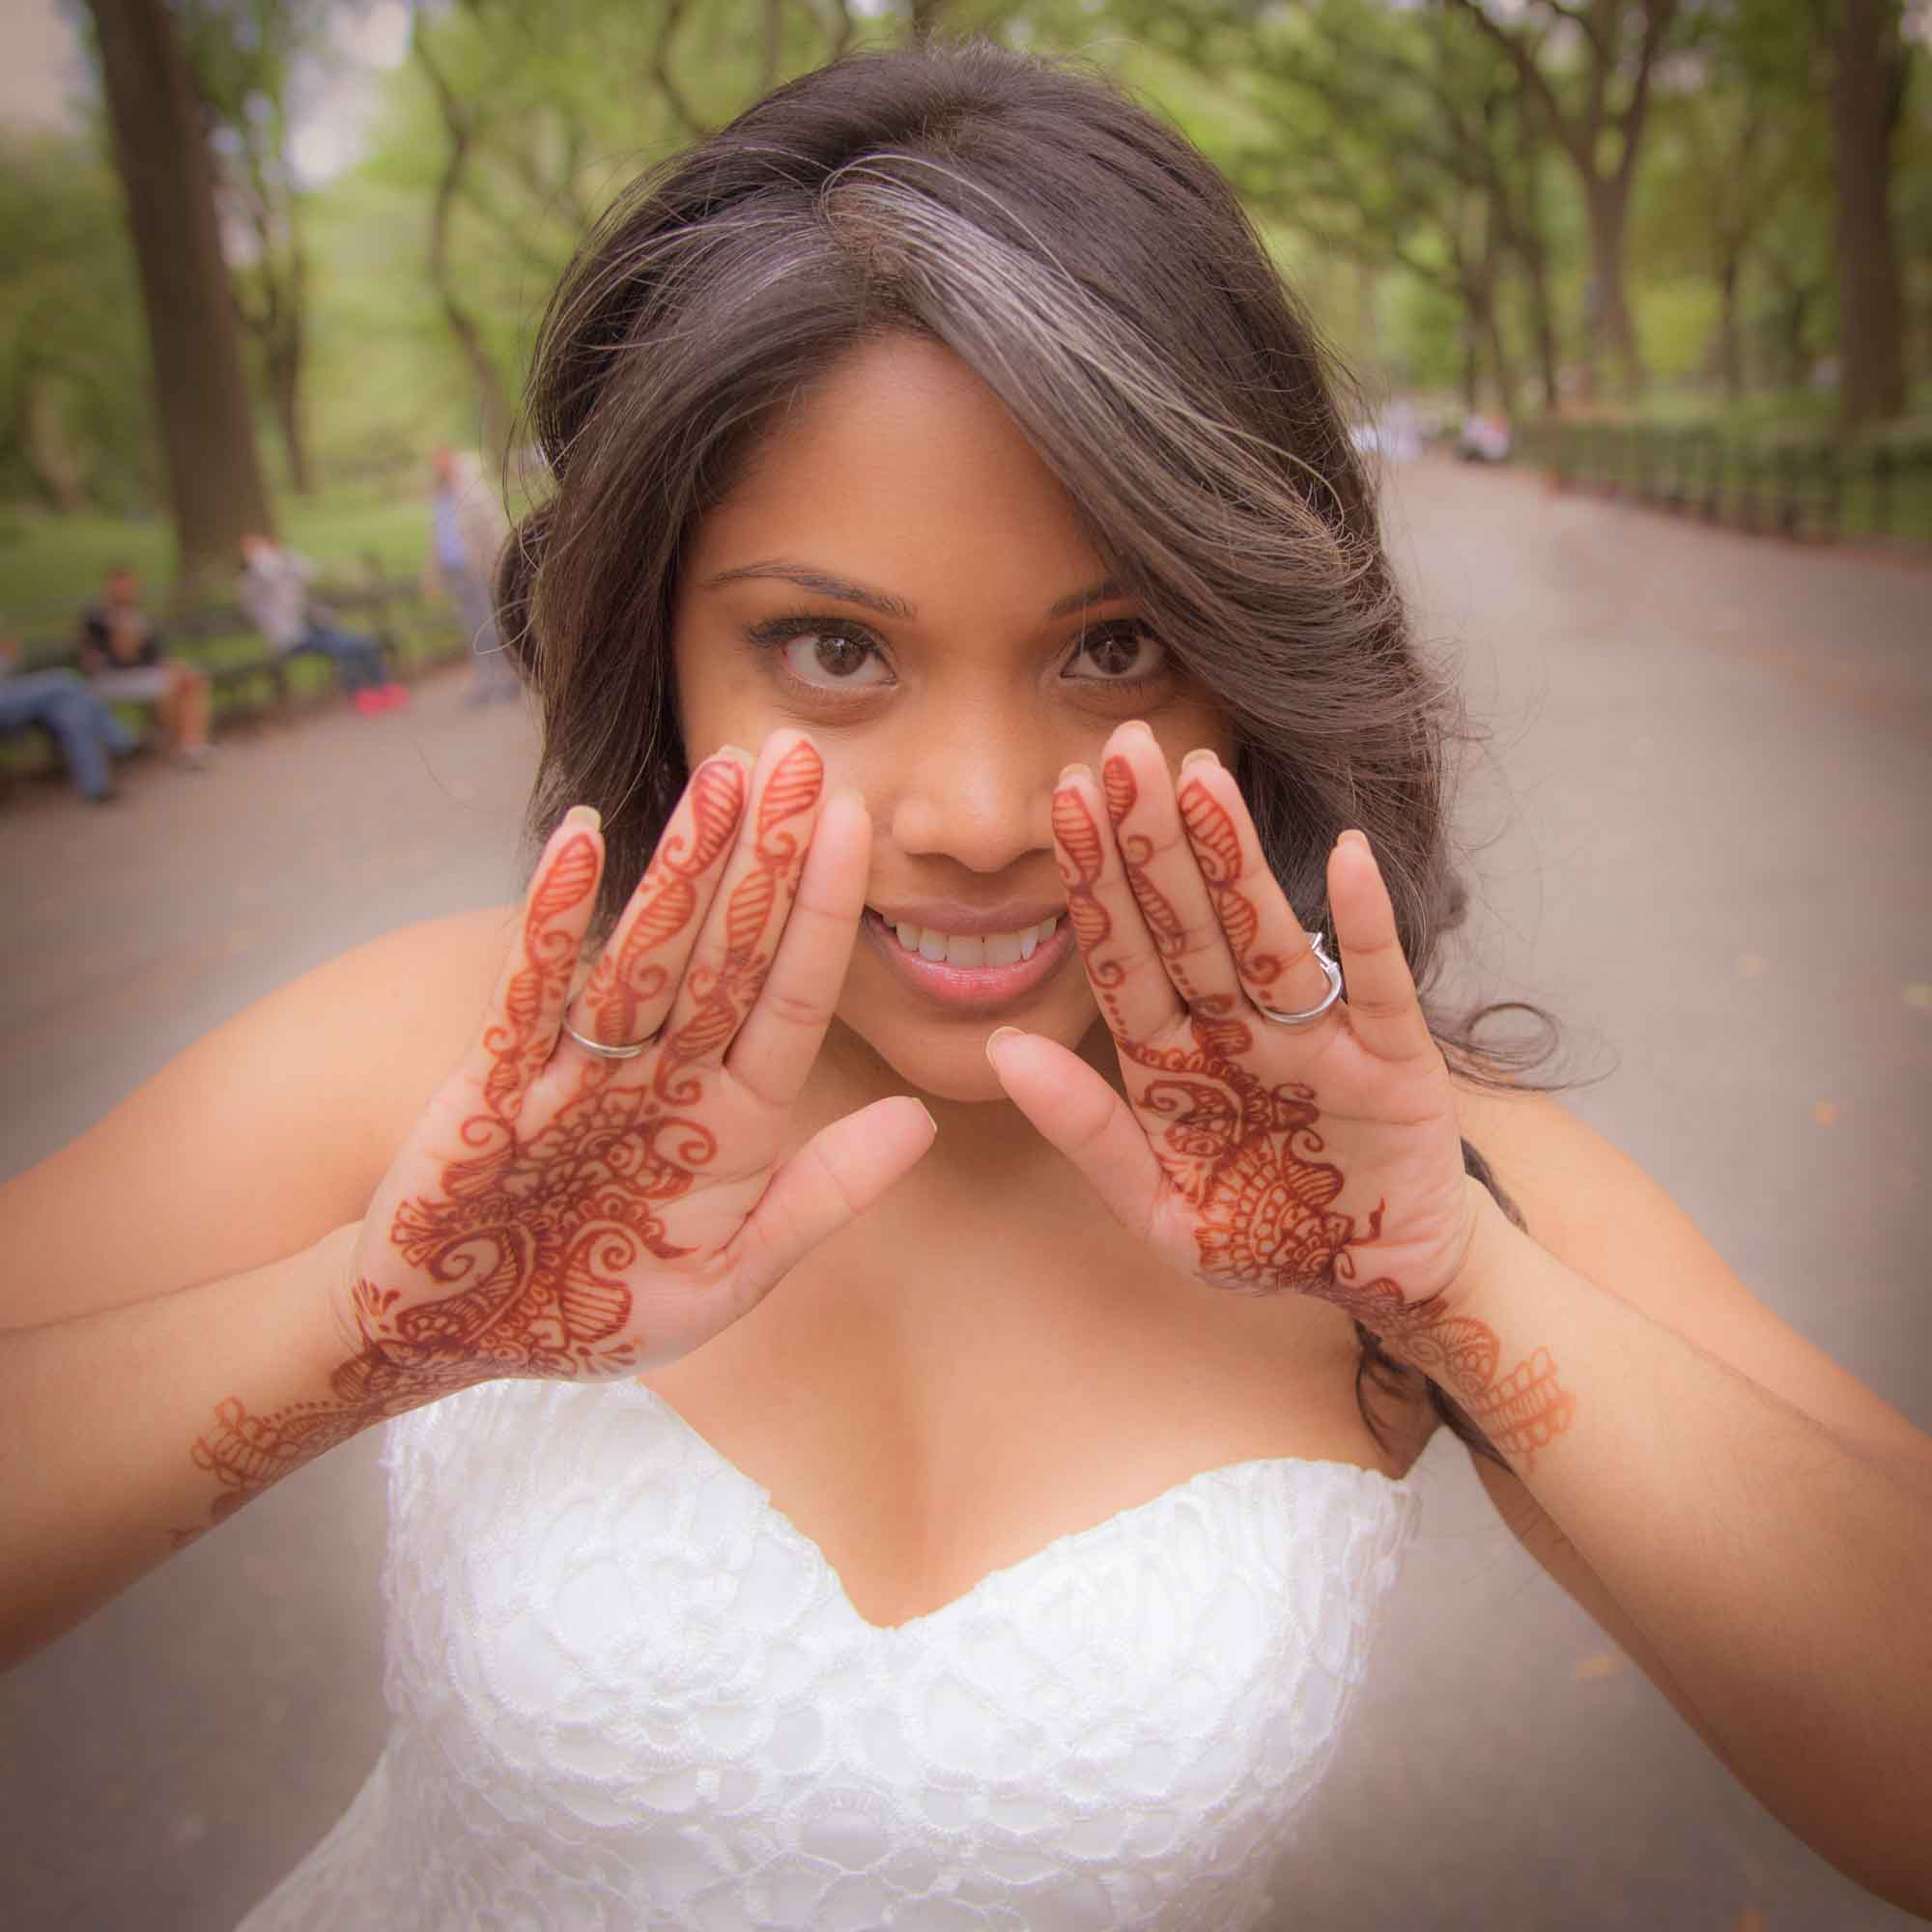 Weddings-Engagements-Jamie-Levine-Photography-New-York-NYC-8.jpg